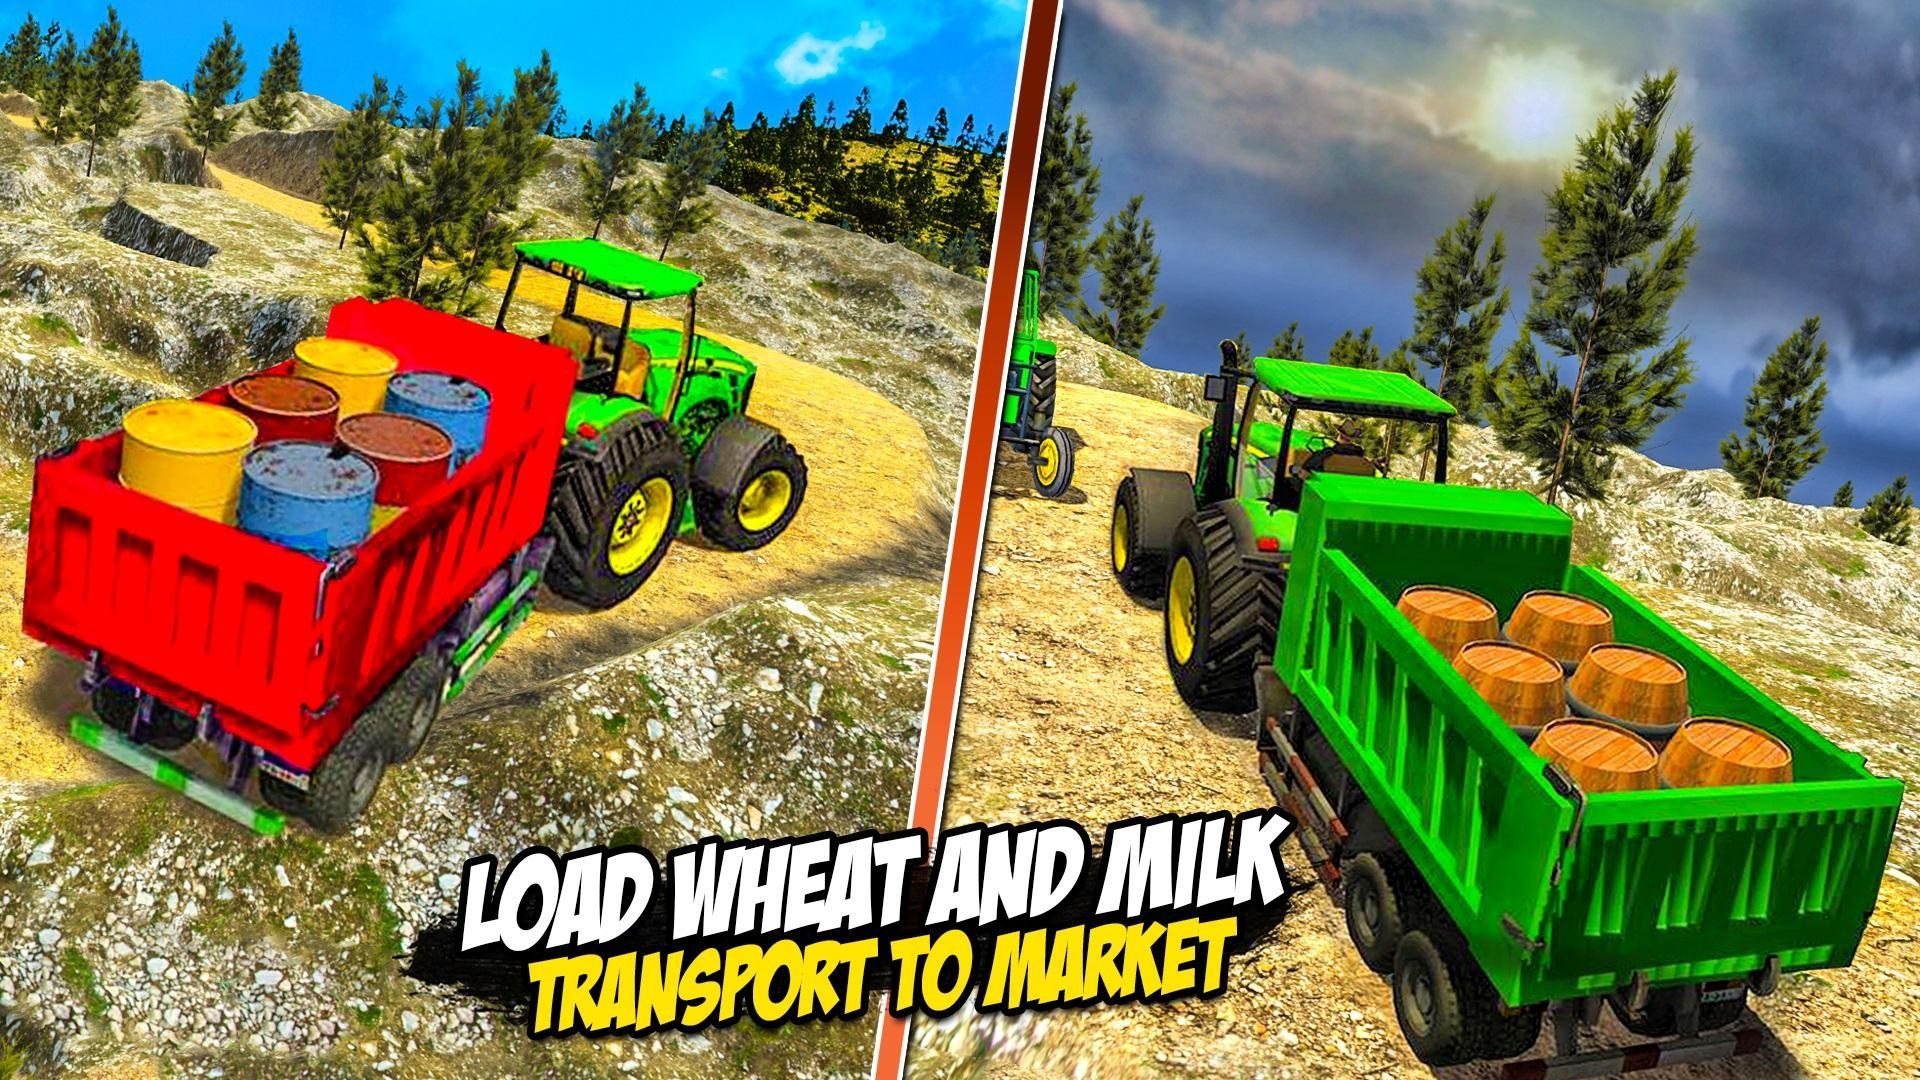 Heavy Tractor Trolley: Tractor Cargo Simulator🚜🚜 3.1 Screenshot 10